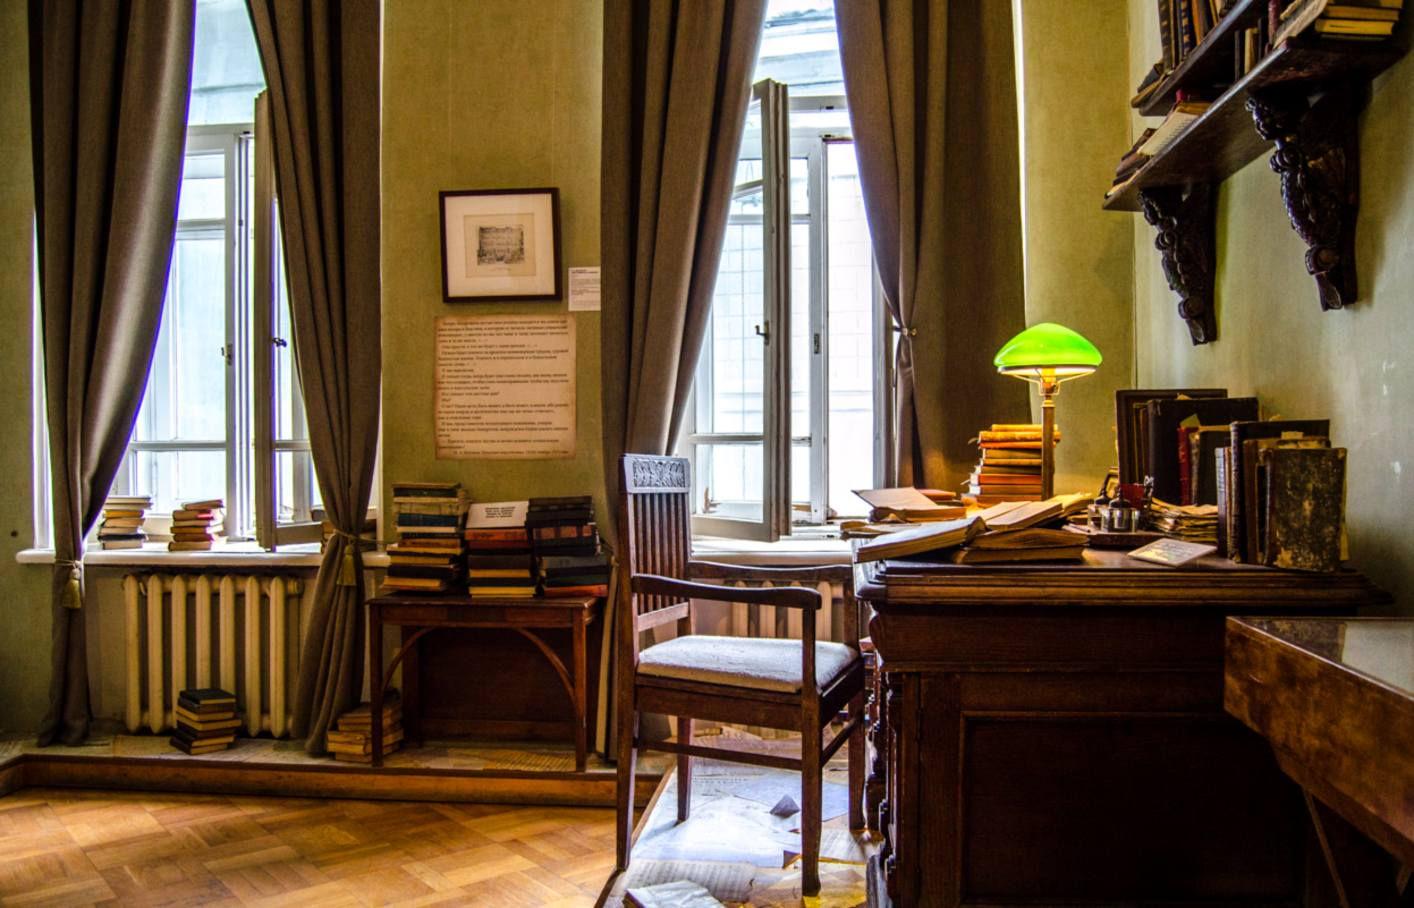 Онлайн-экскурсия по Музею Михаила Булгакова фото 1